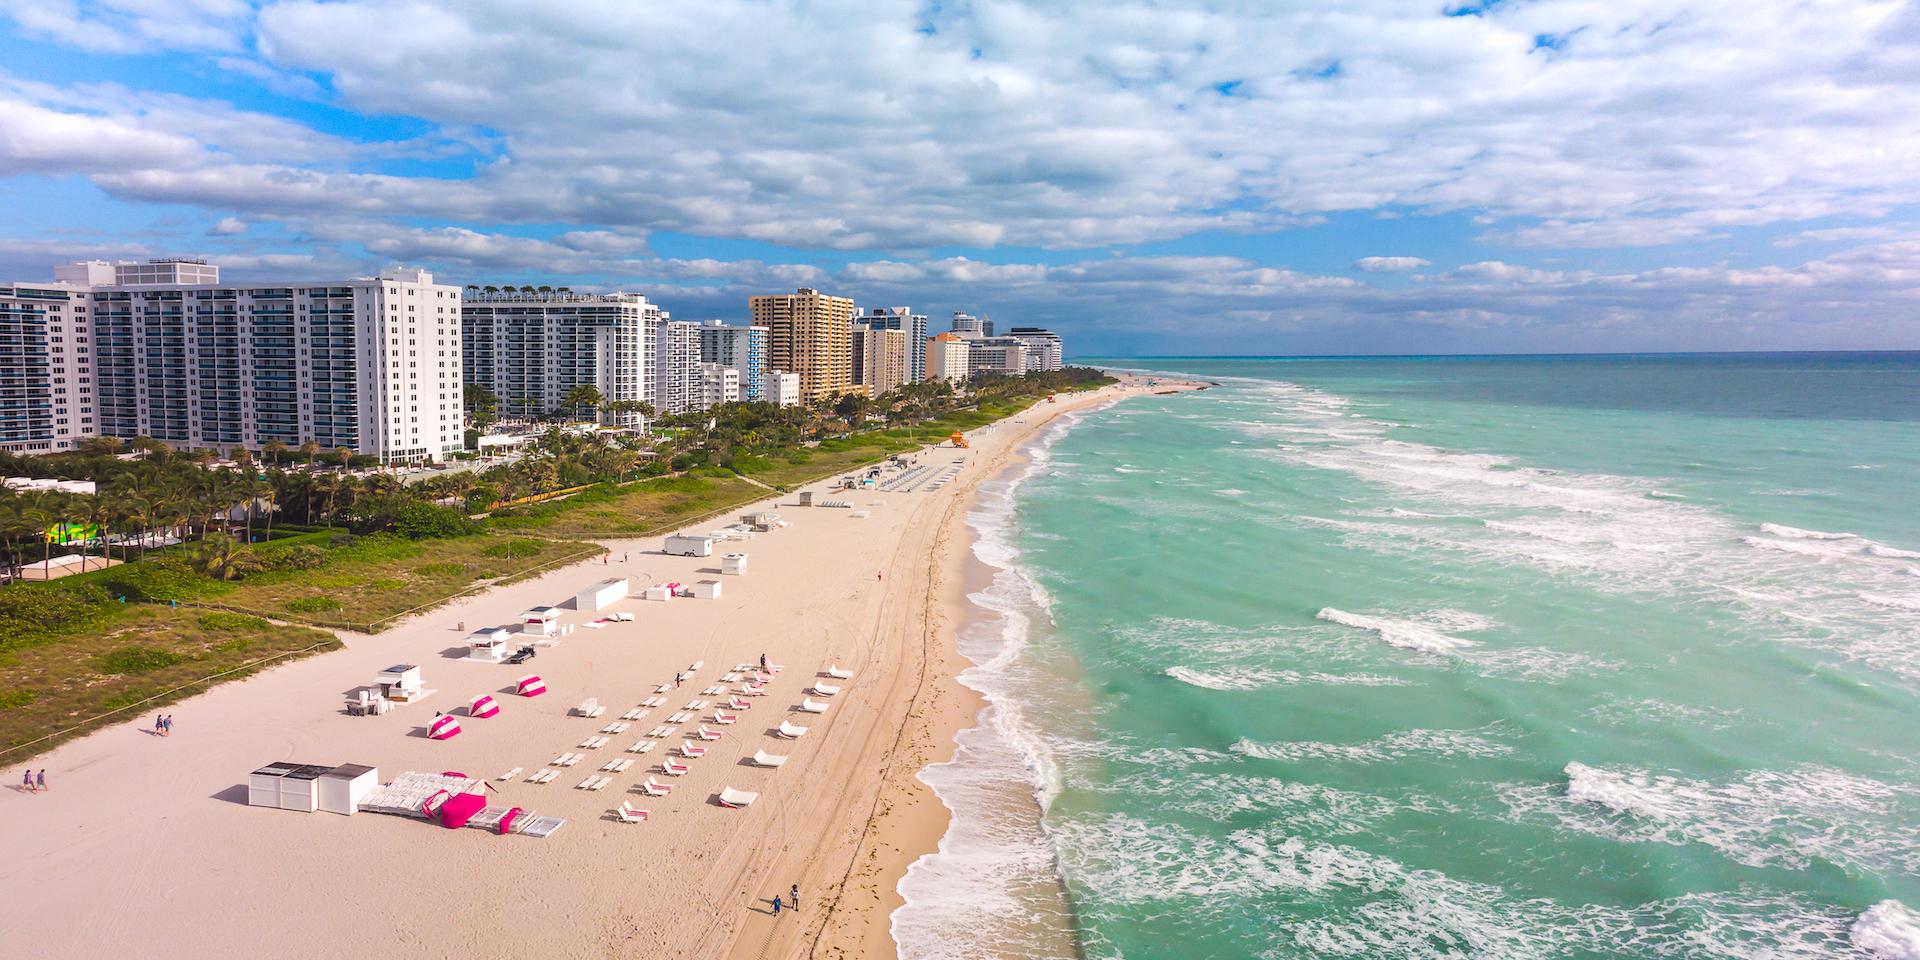 Emirates commences flights to Miami